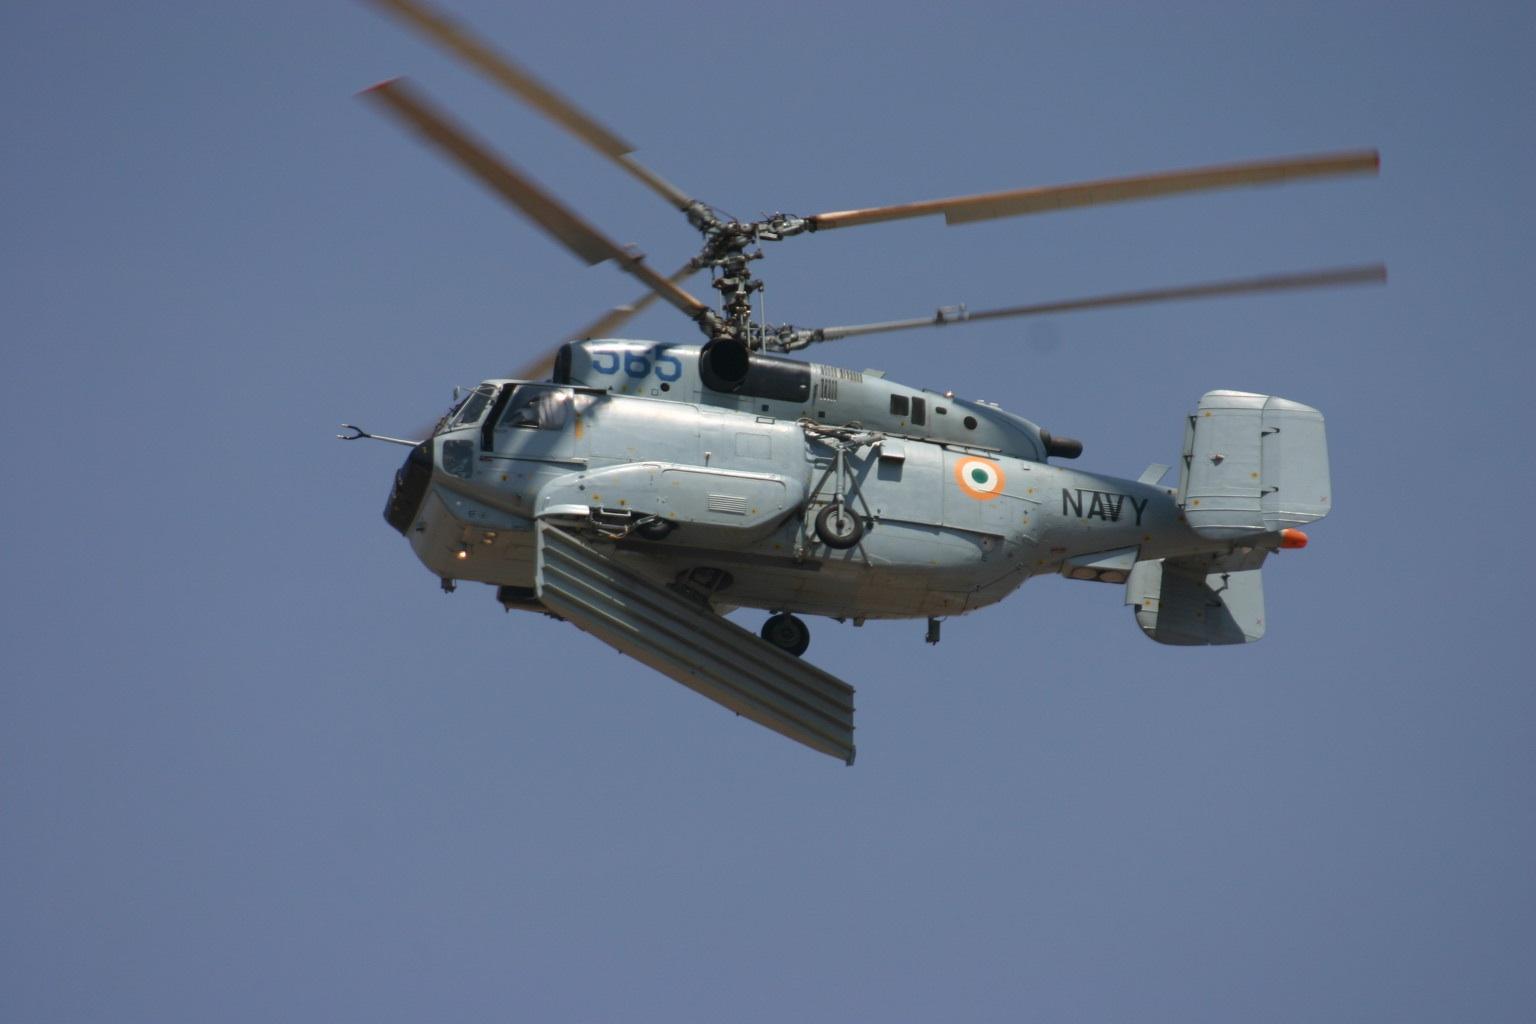 IN585_Kamov_KA.28_Indian_Navy_(8413501509).jpg